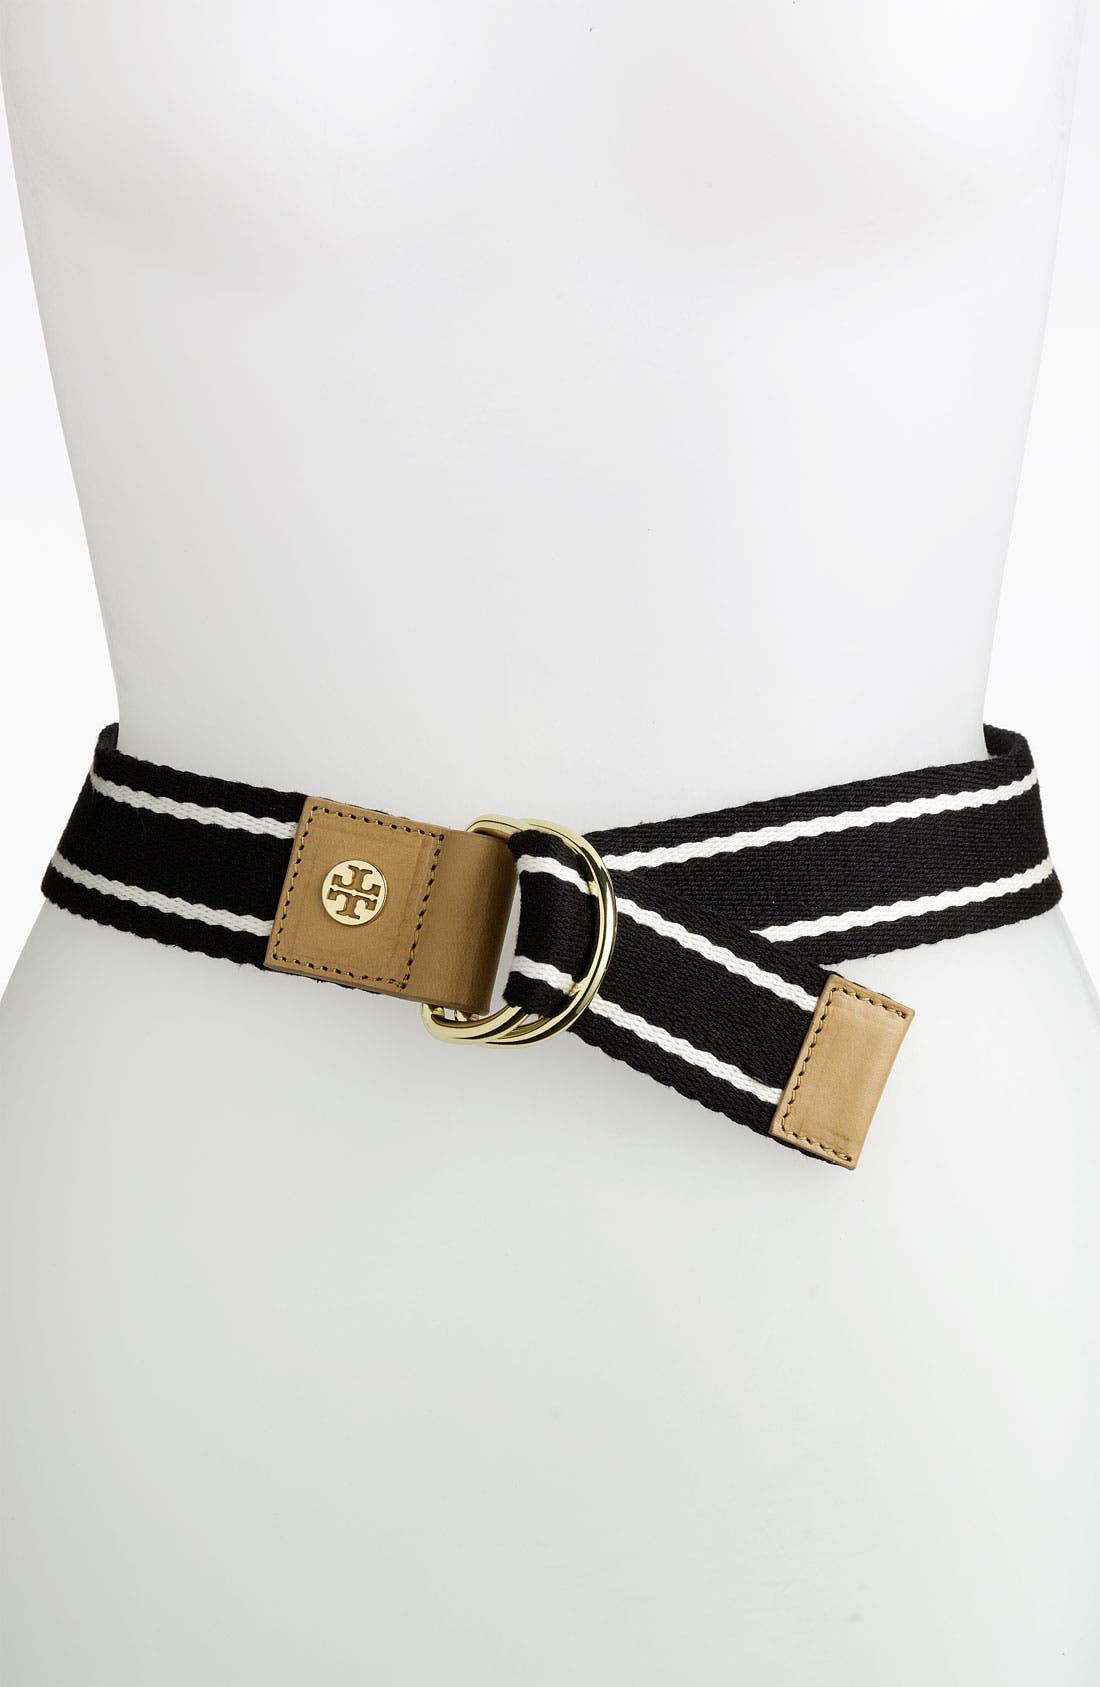 Alternate Image 1 Selected - Tory Burch Stripe Webbing Belt